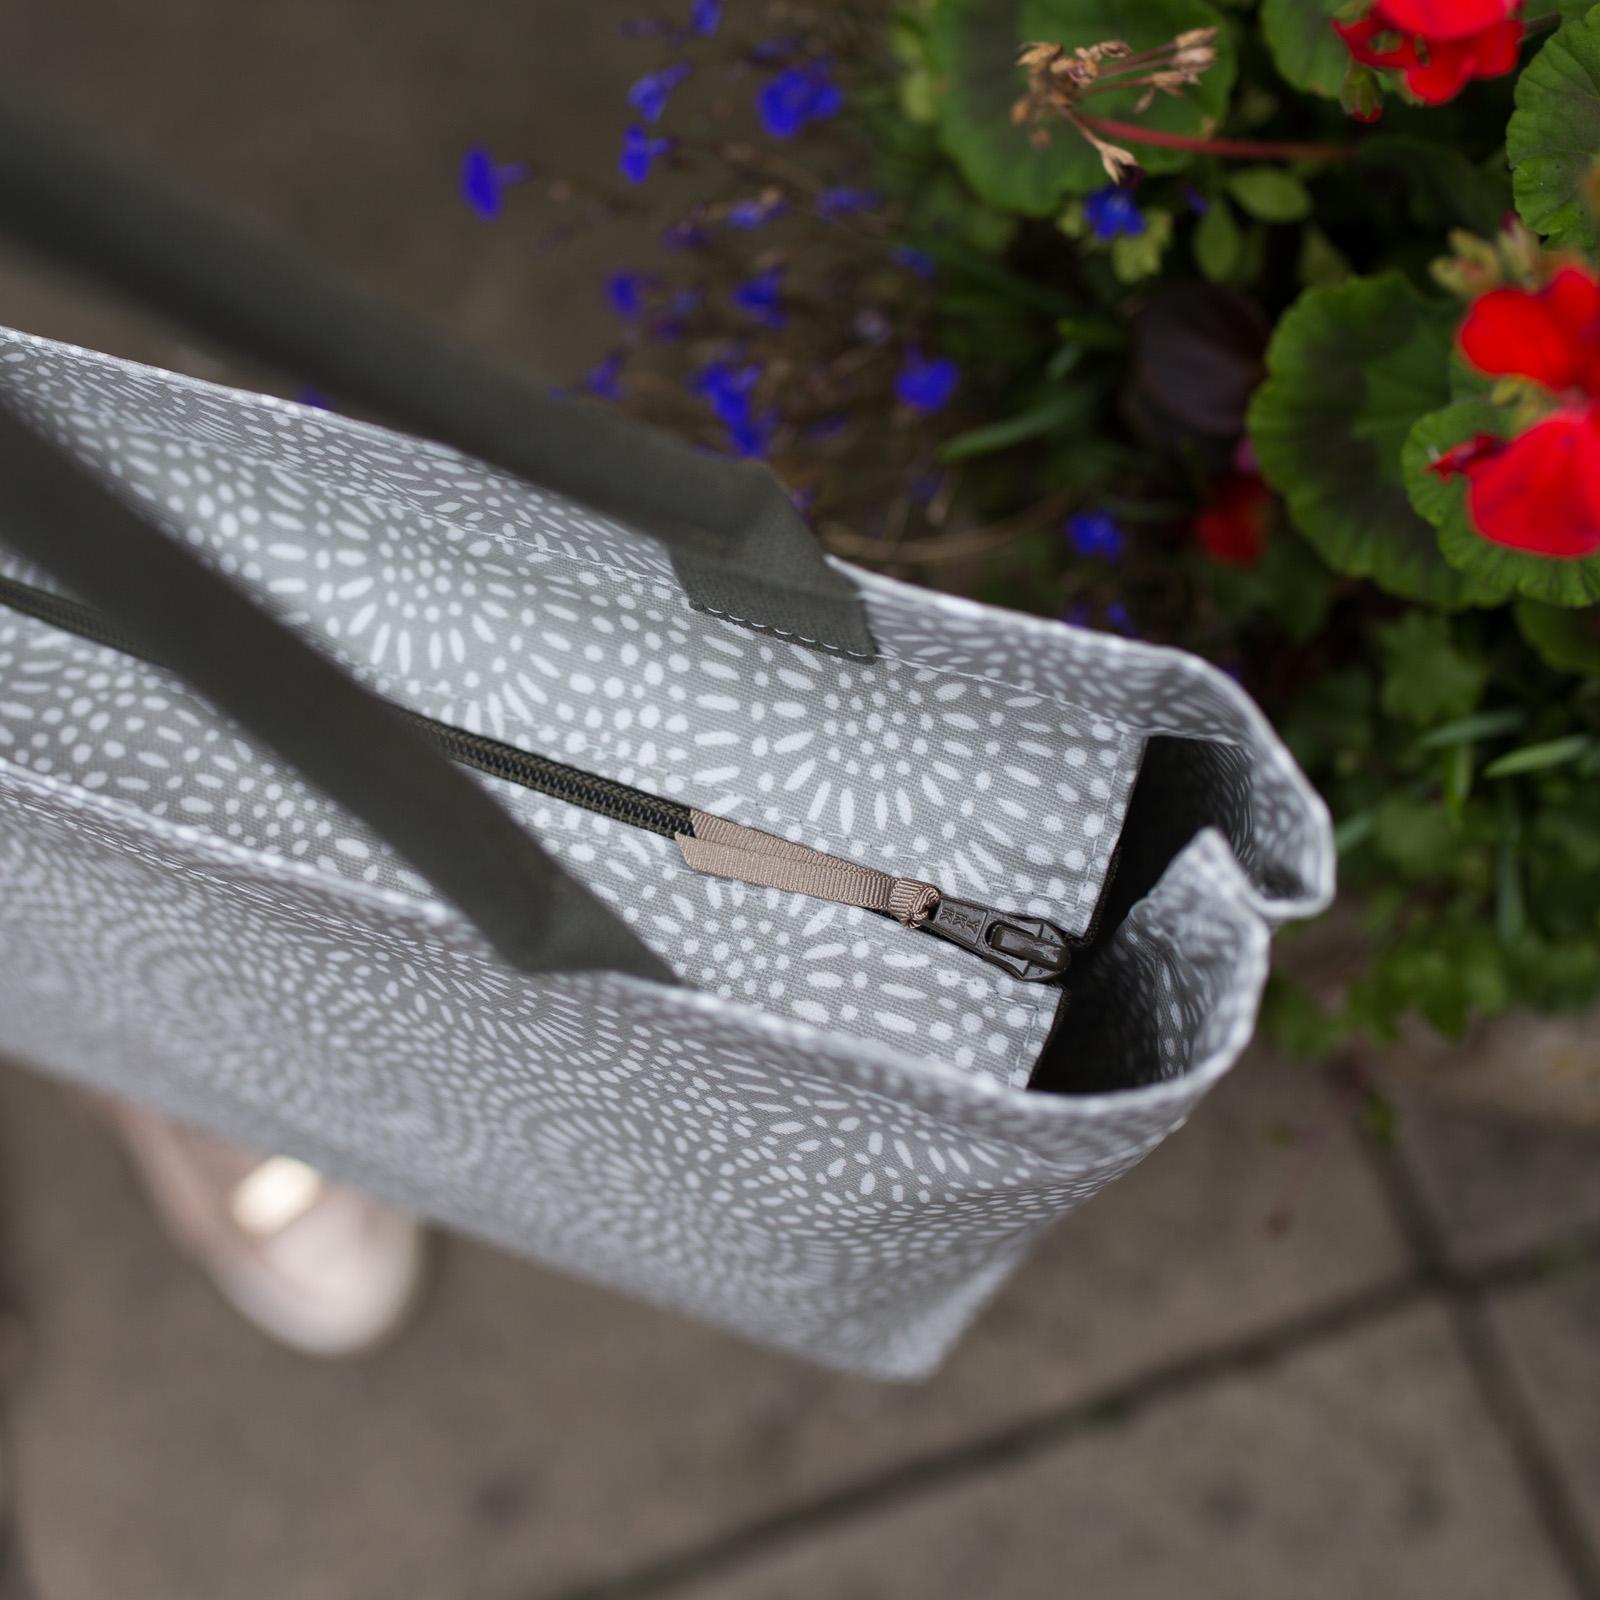 Stone Sunburst Medium Zip Tote Bag with Khaki Handles